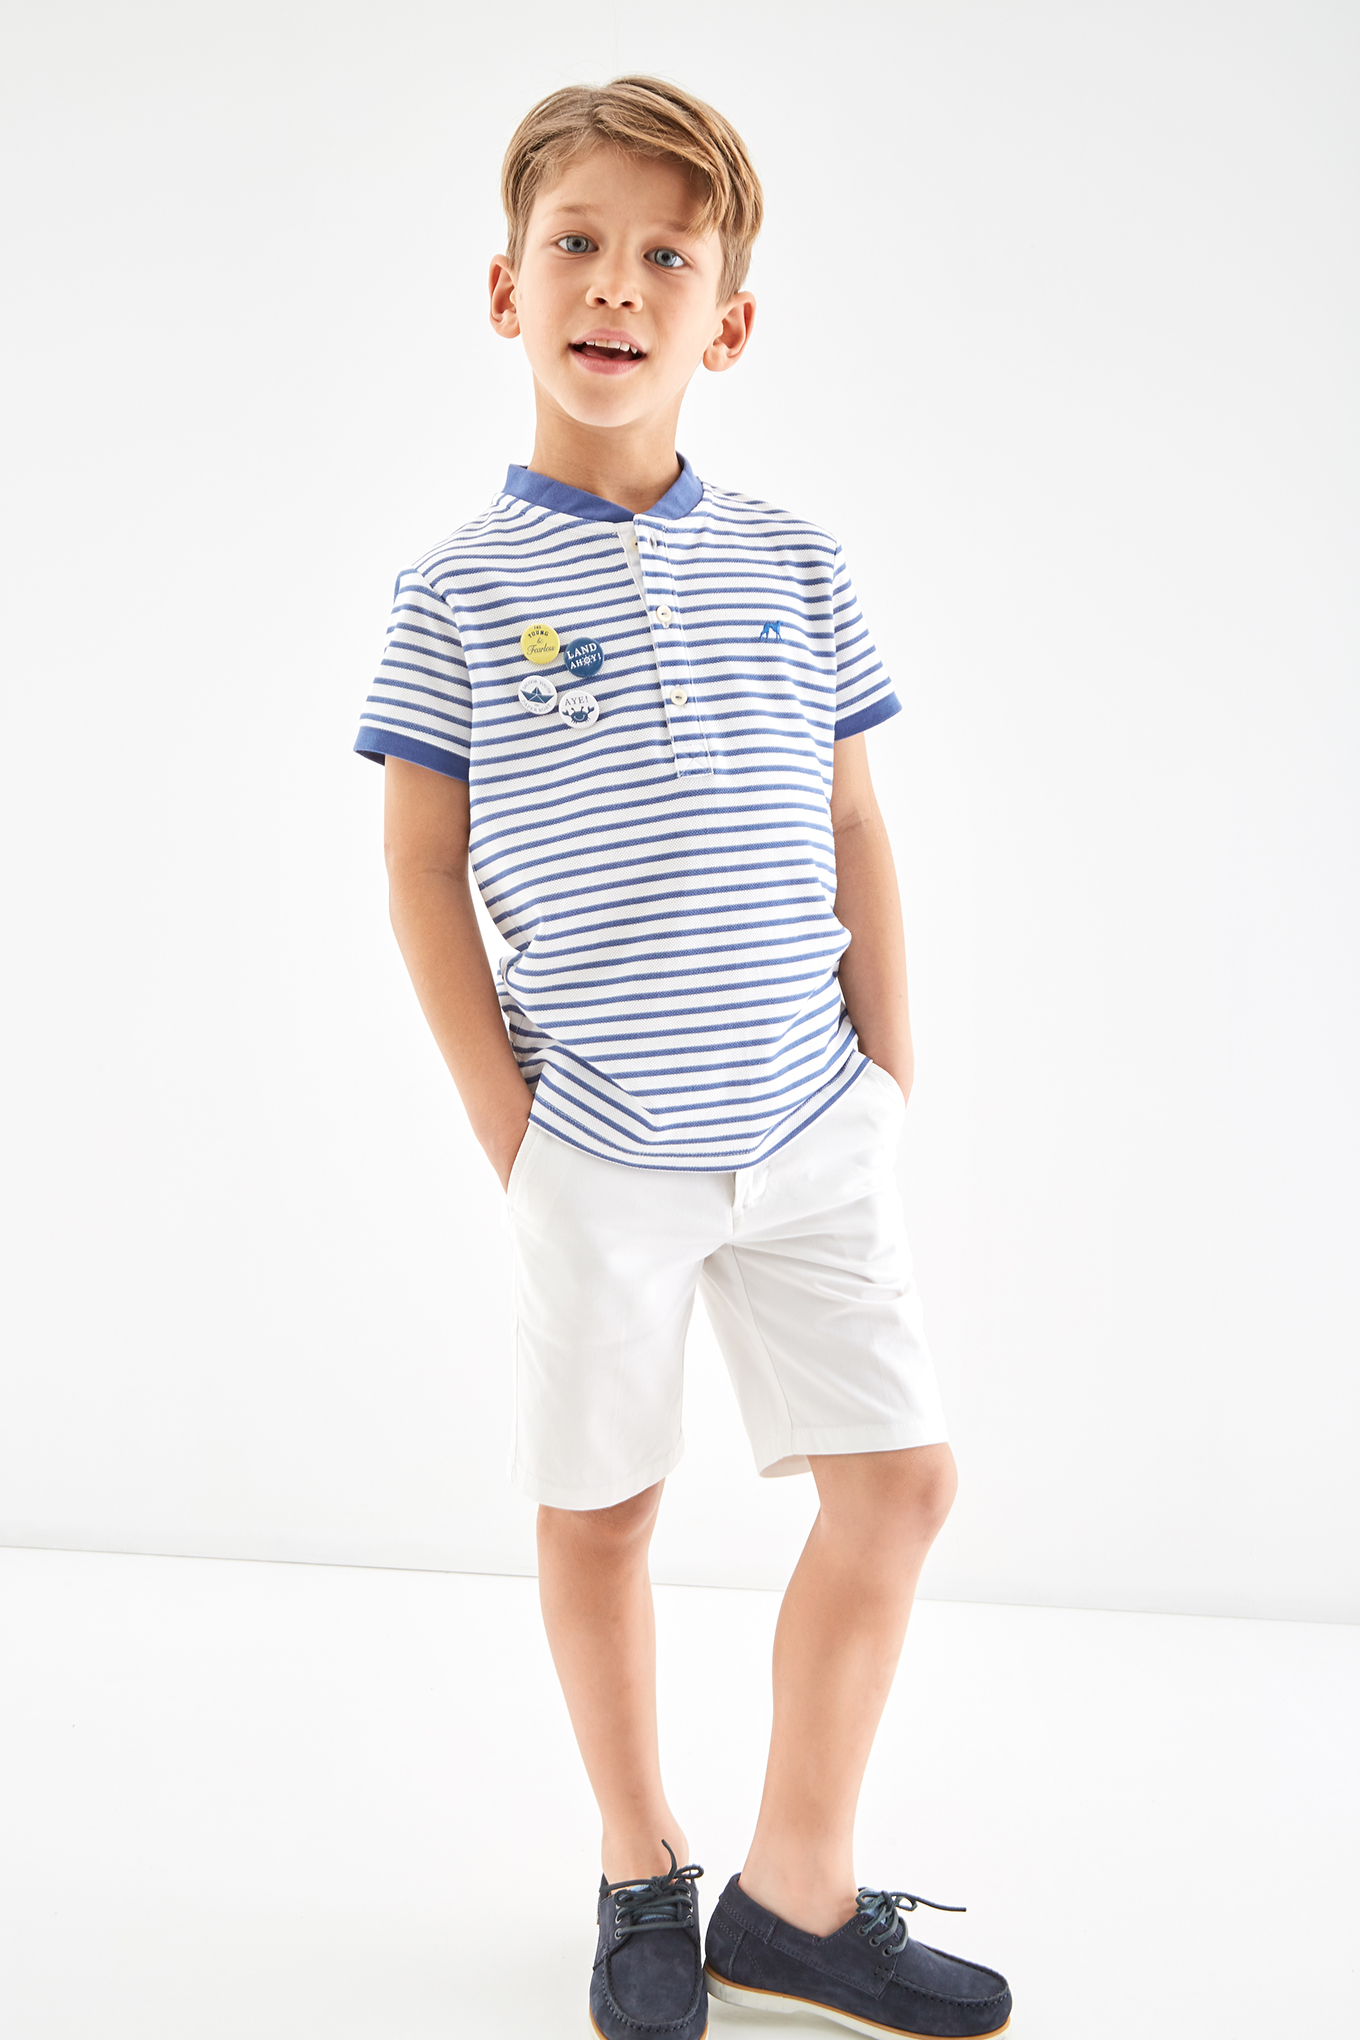 Bermuda White Casual Boy